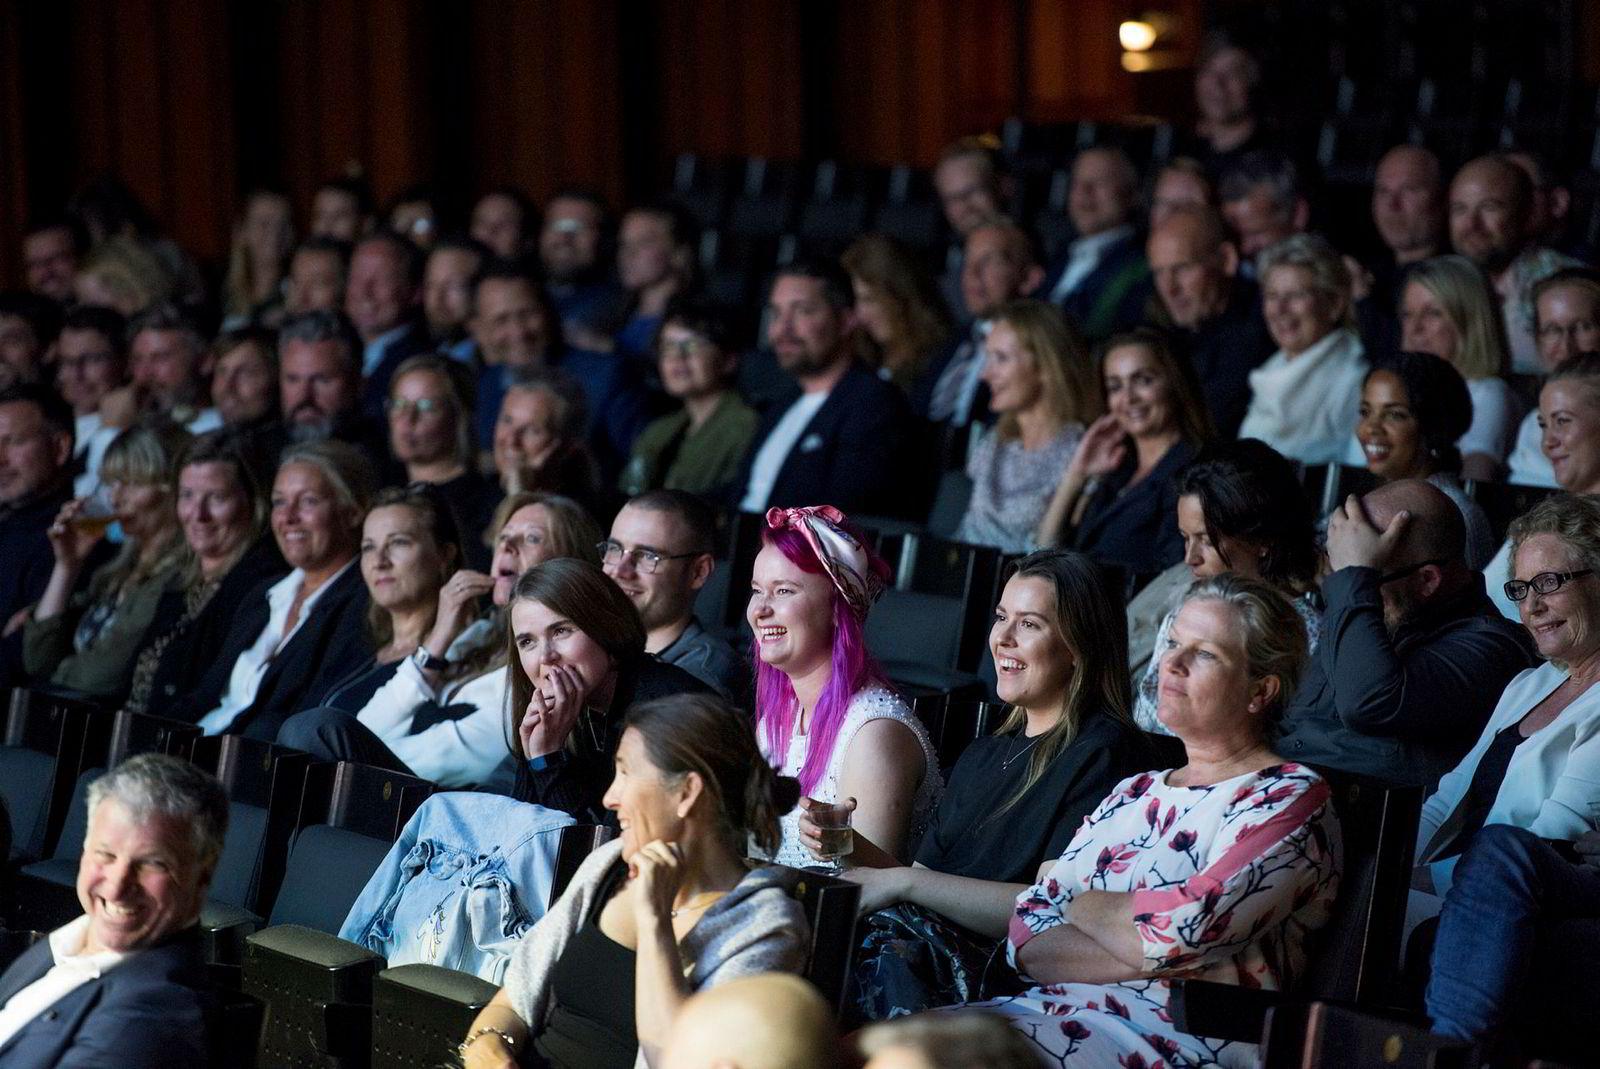 Salen i Oslo Konserthus under kåringen av årets byrå.